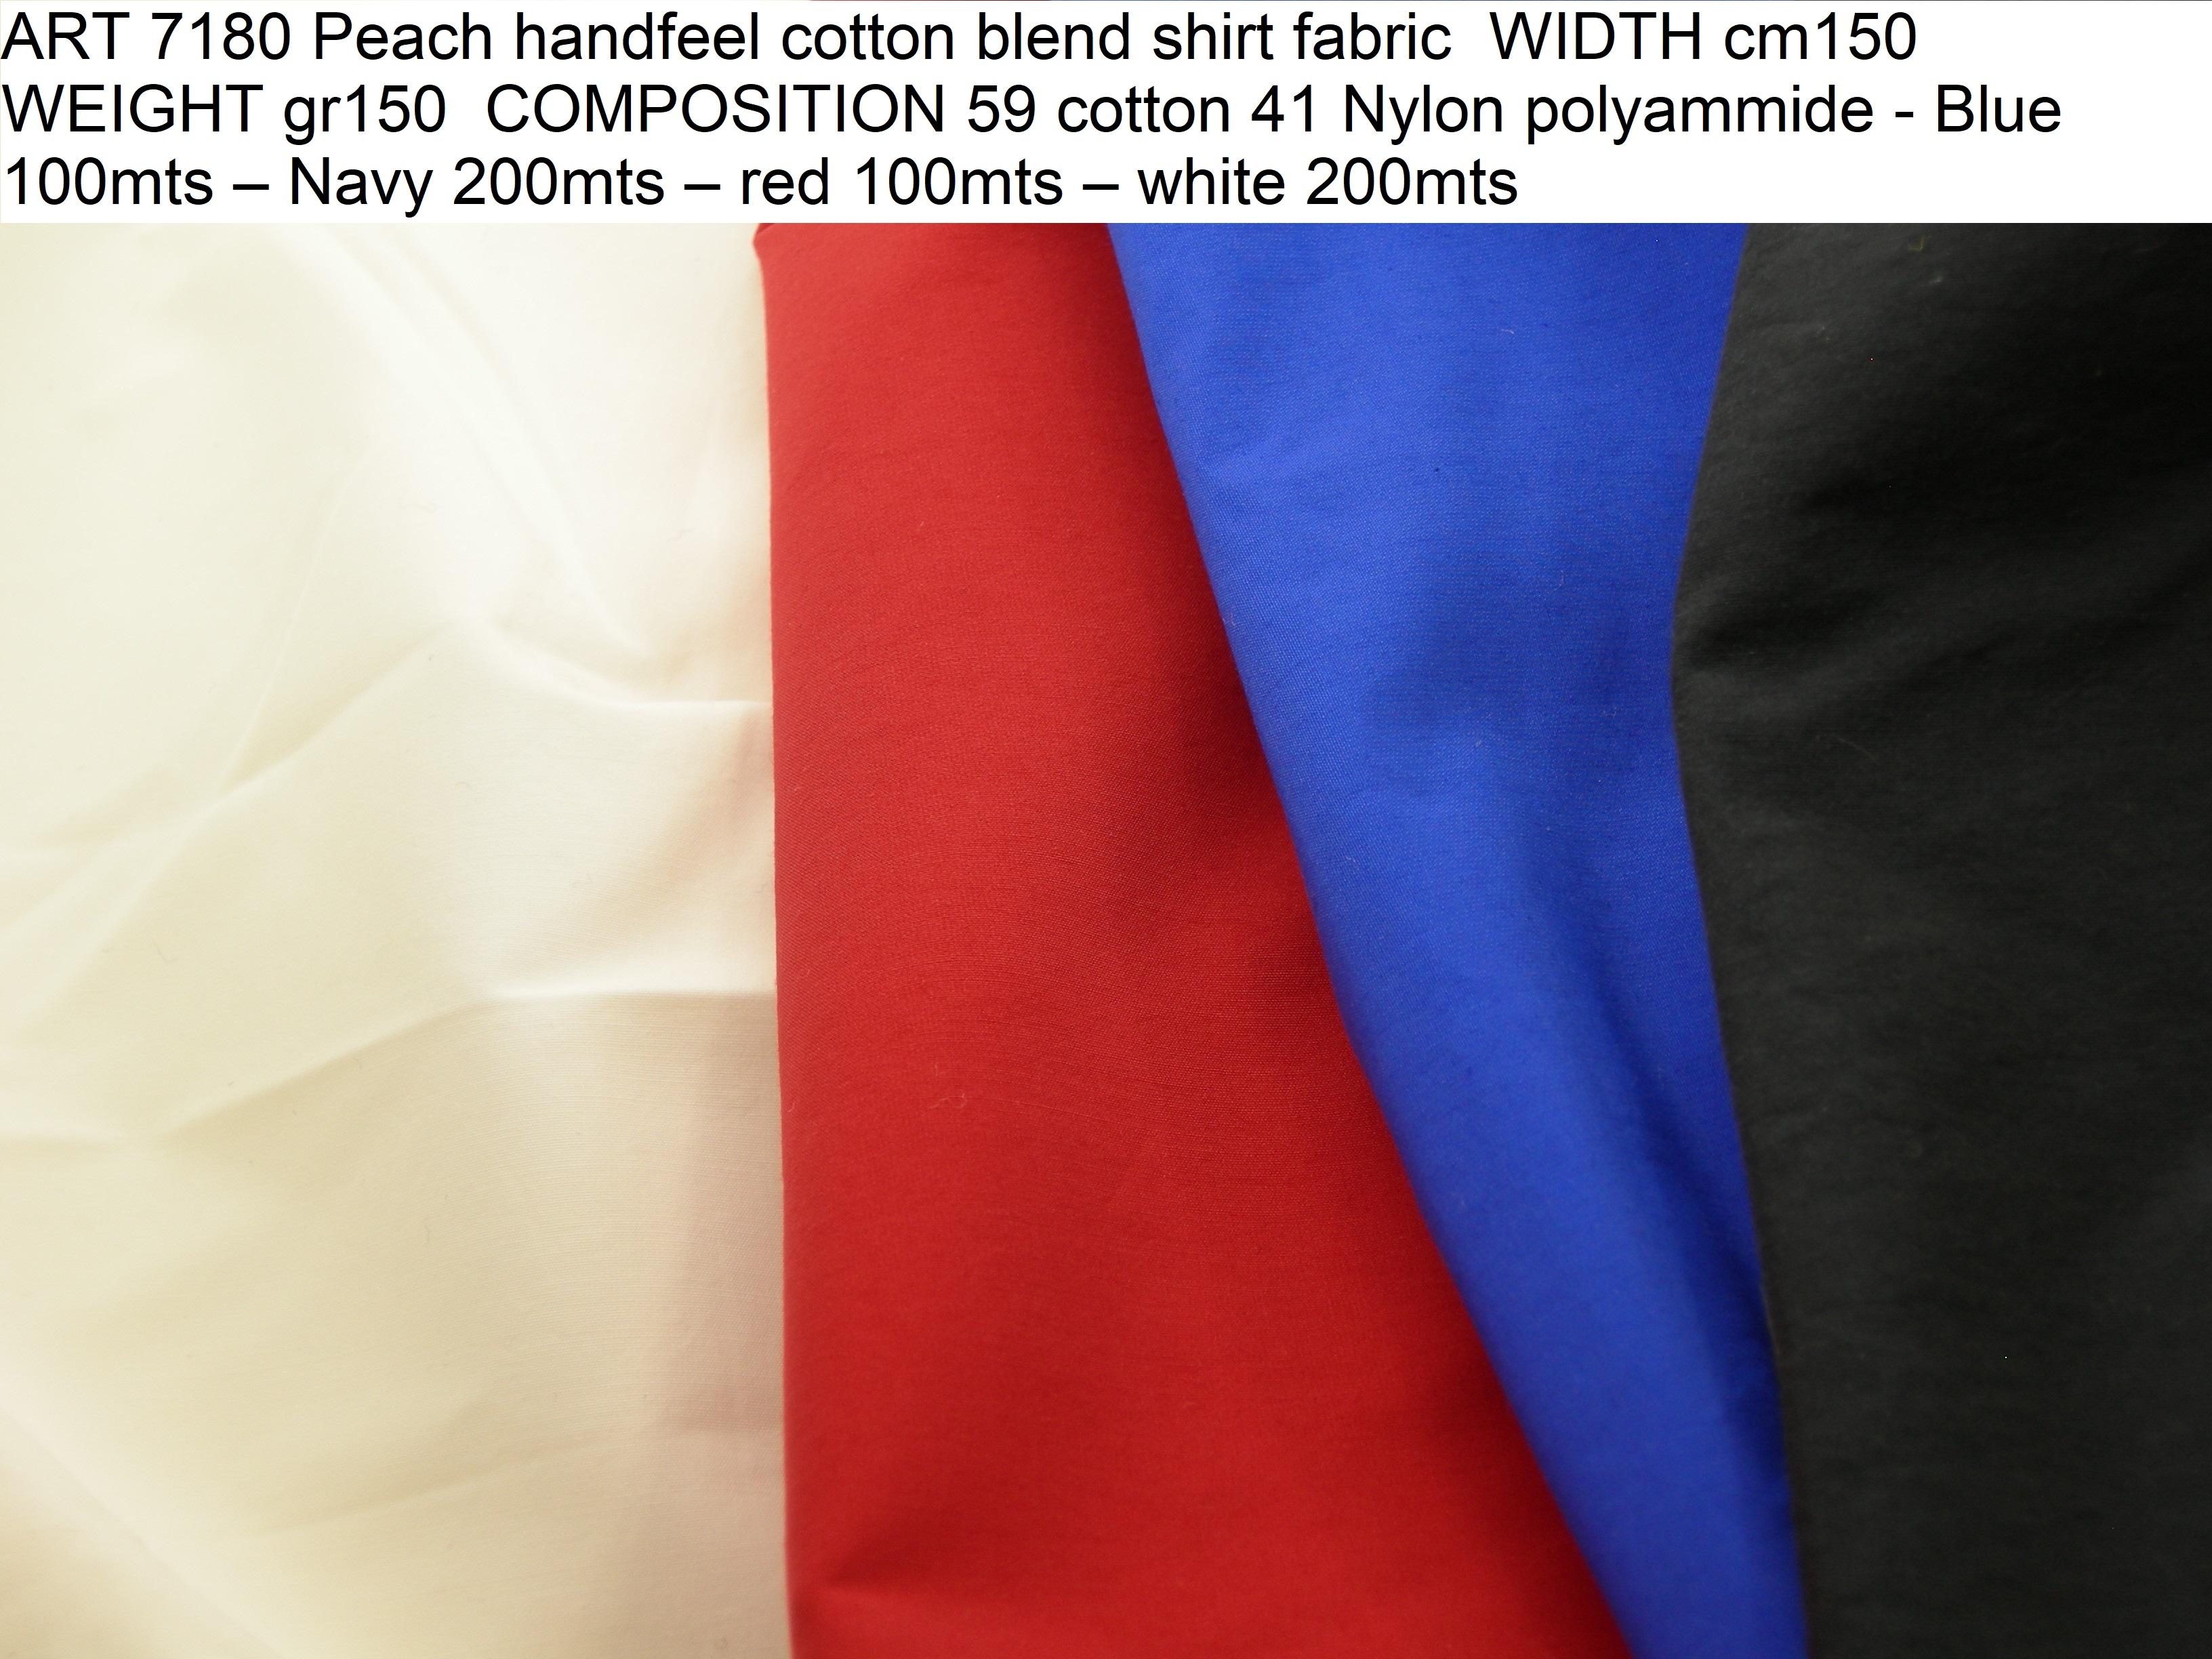 ART 7180 Peach handfeel cotton blend shirt fabric WIDTH cm150 WEIGHT gr150 COMPOSITION 59 cotton 41 Nylon polyammide - Blue 100mts – Navy 200mts – red 100mts – white 200mts